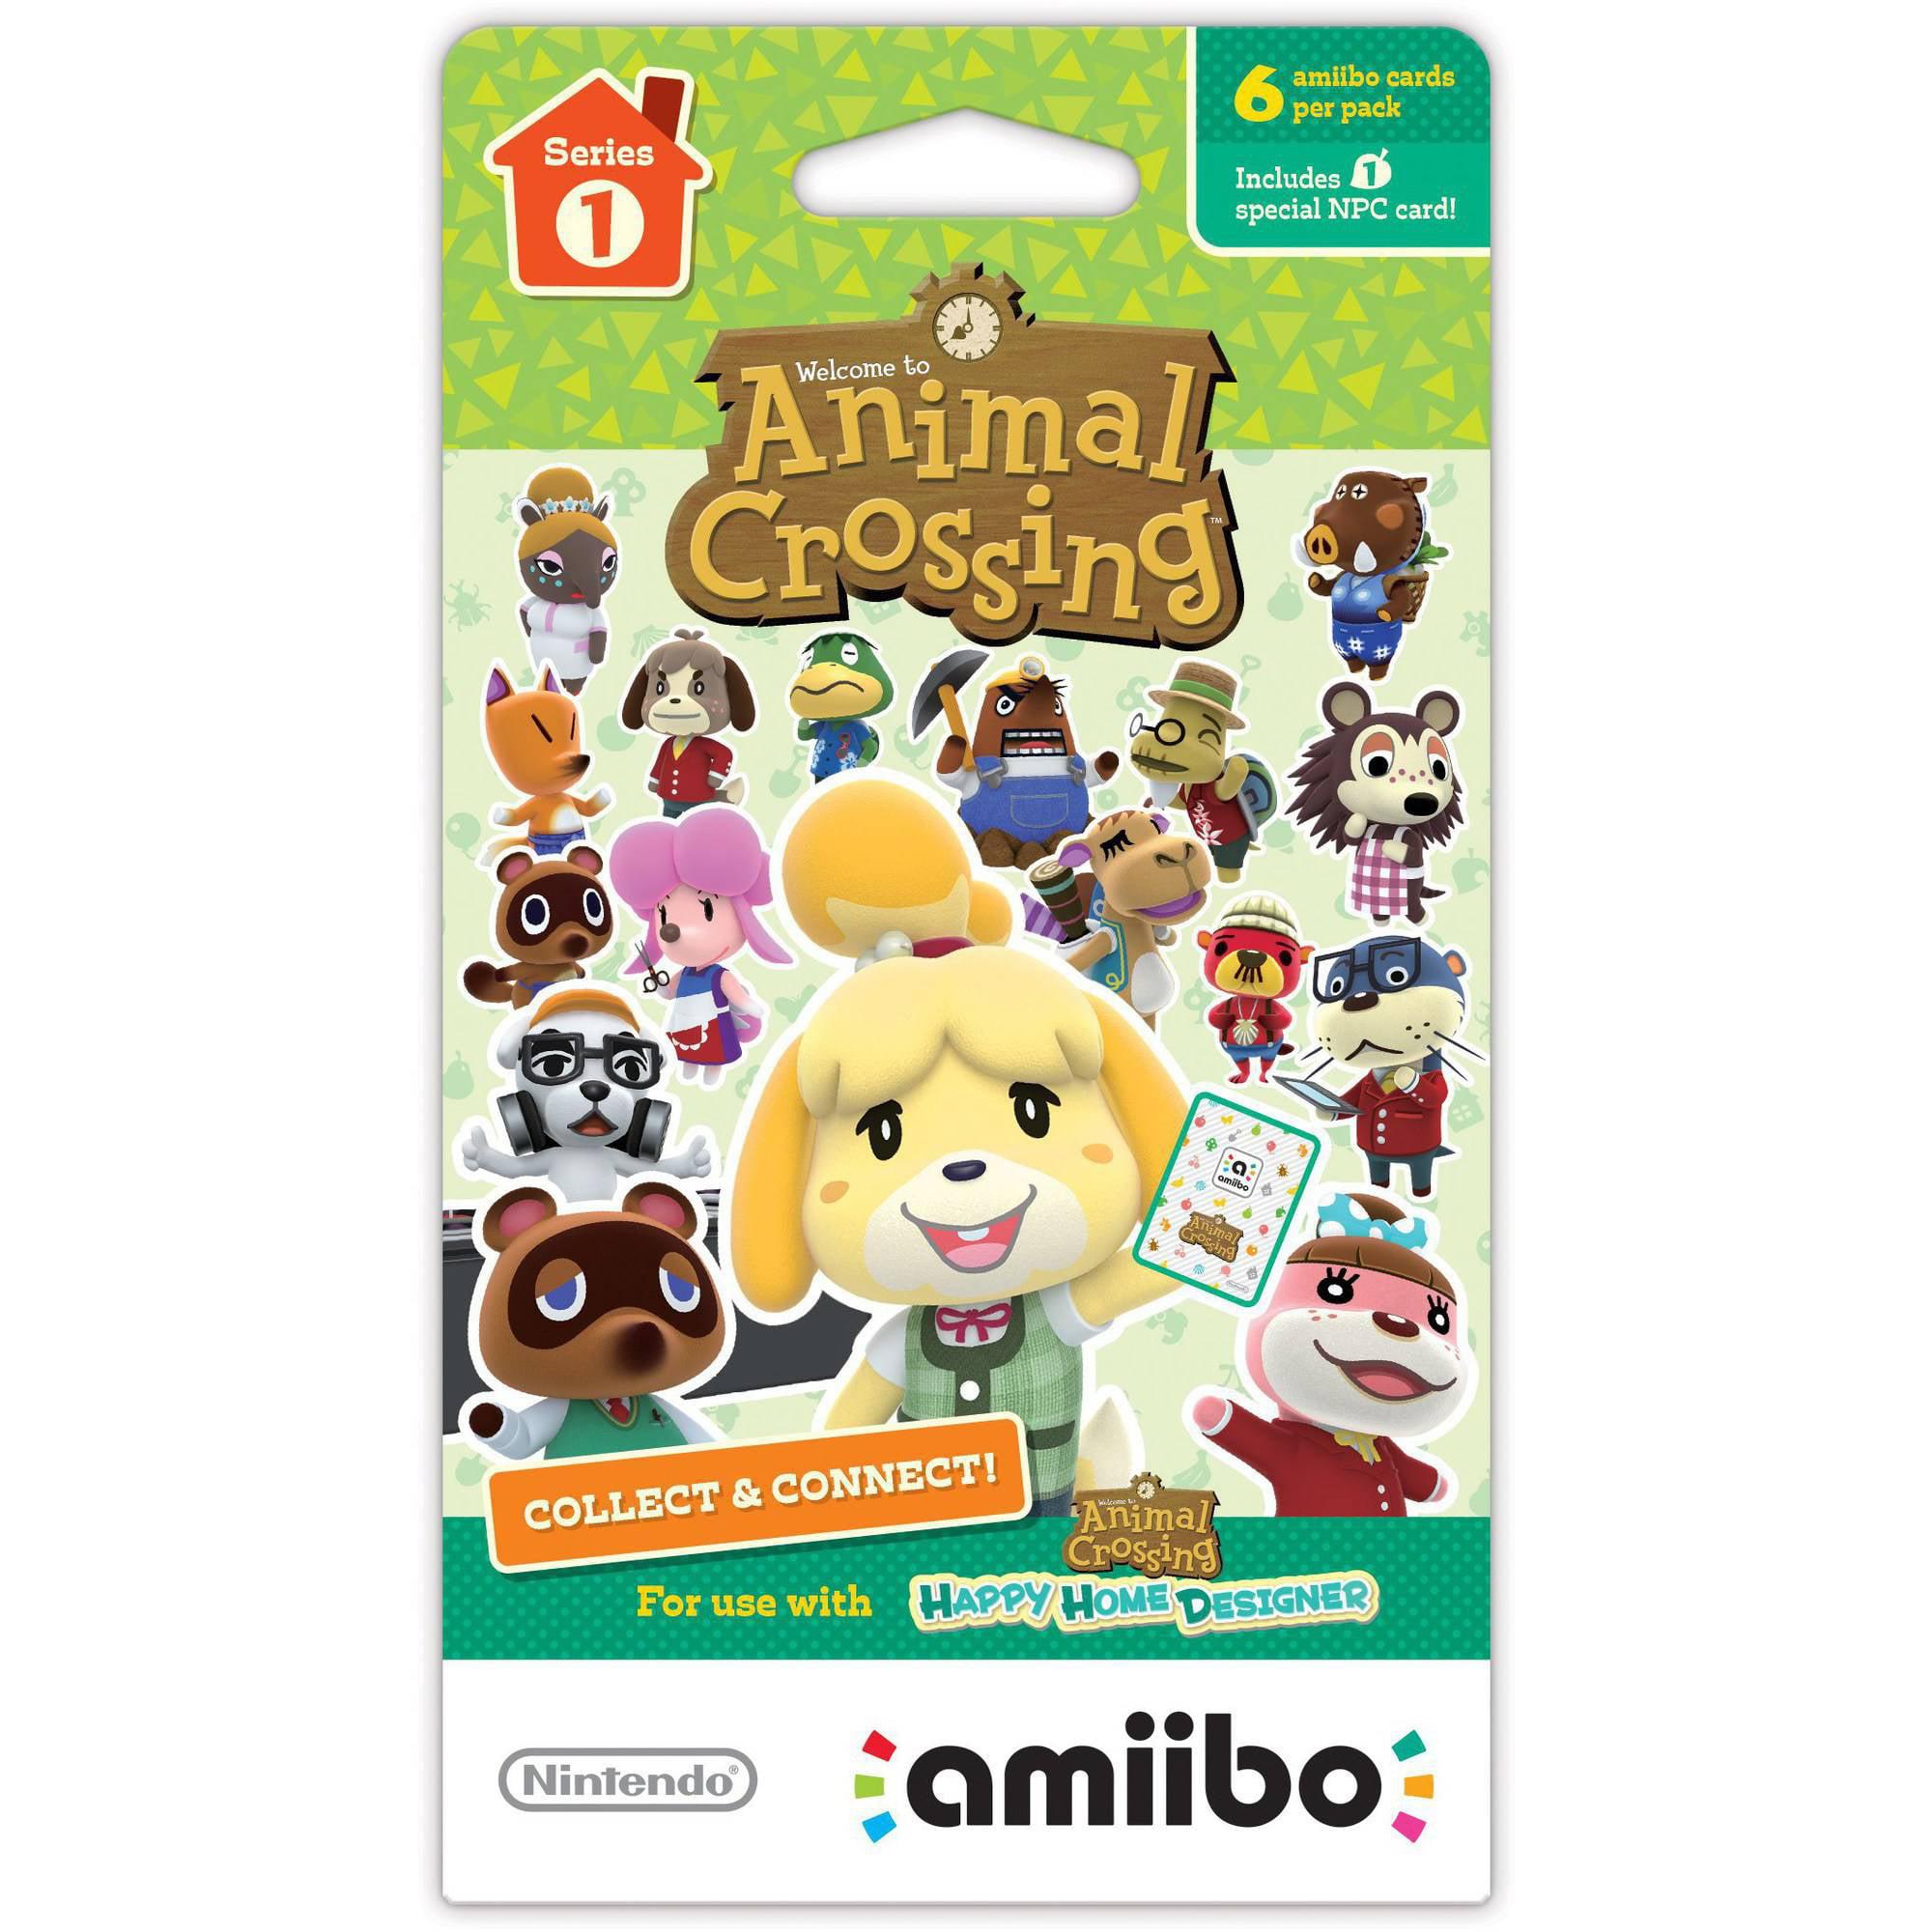 Animal Crossing amiibo Cards 6-Pack Series 1 (Nintendo WiiU or New Nintendo 3DS)